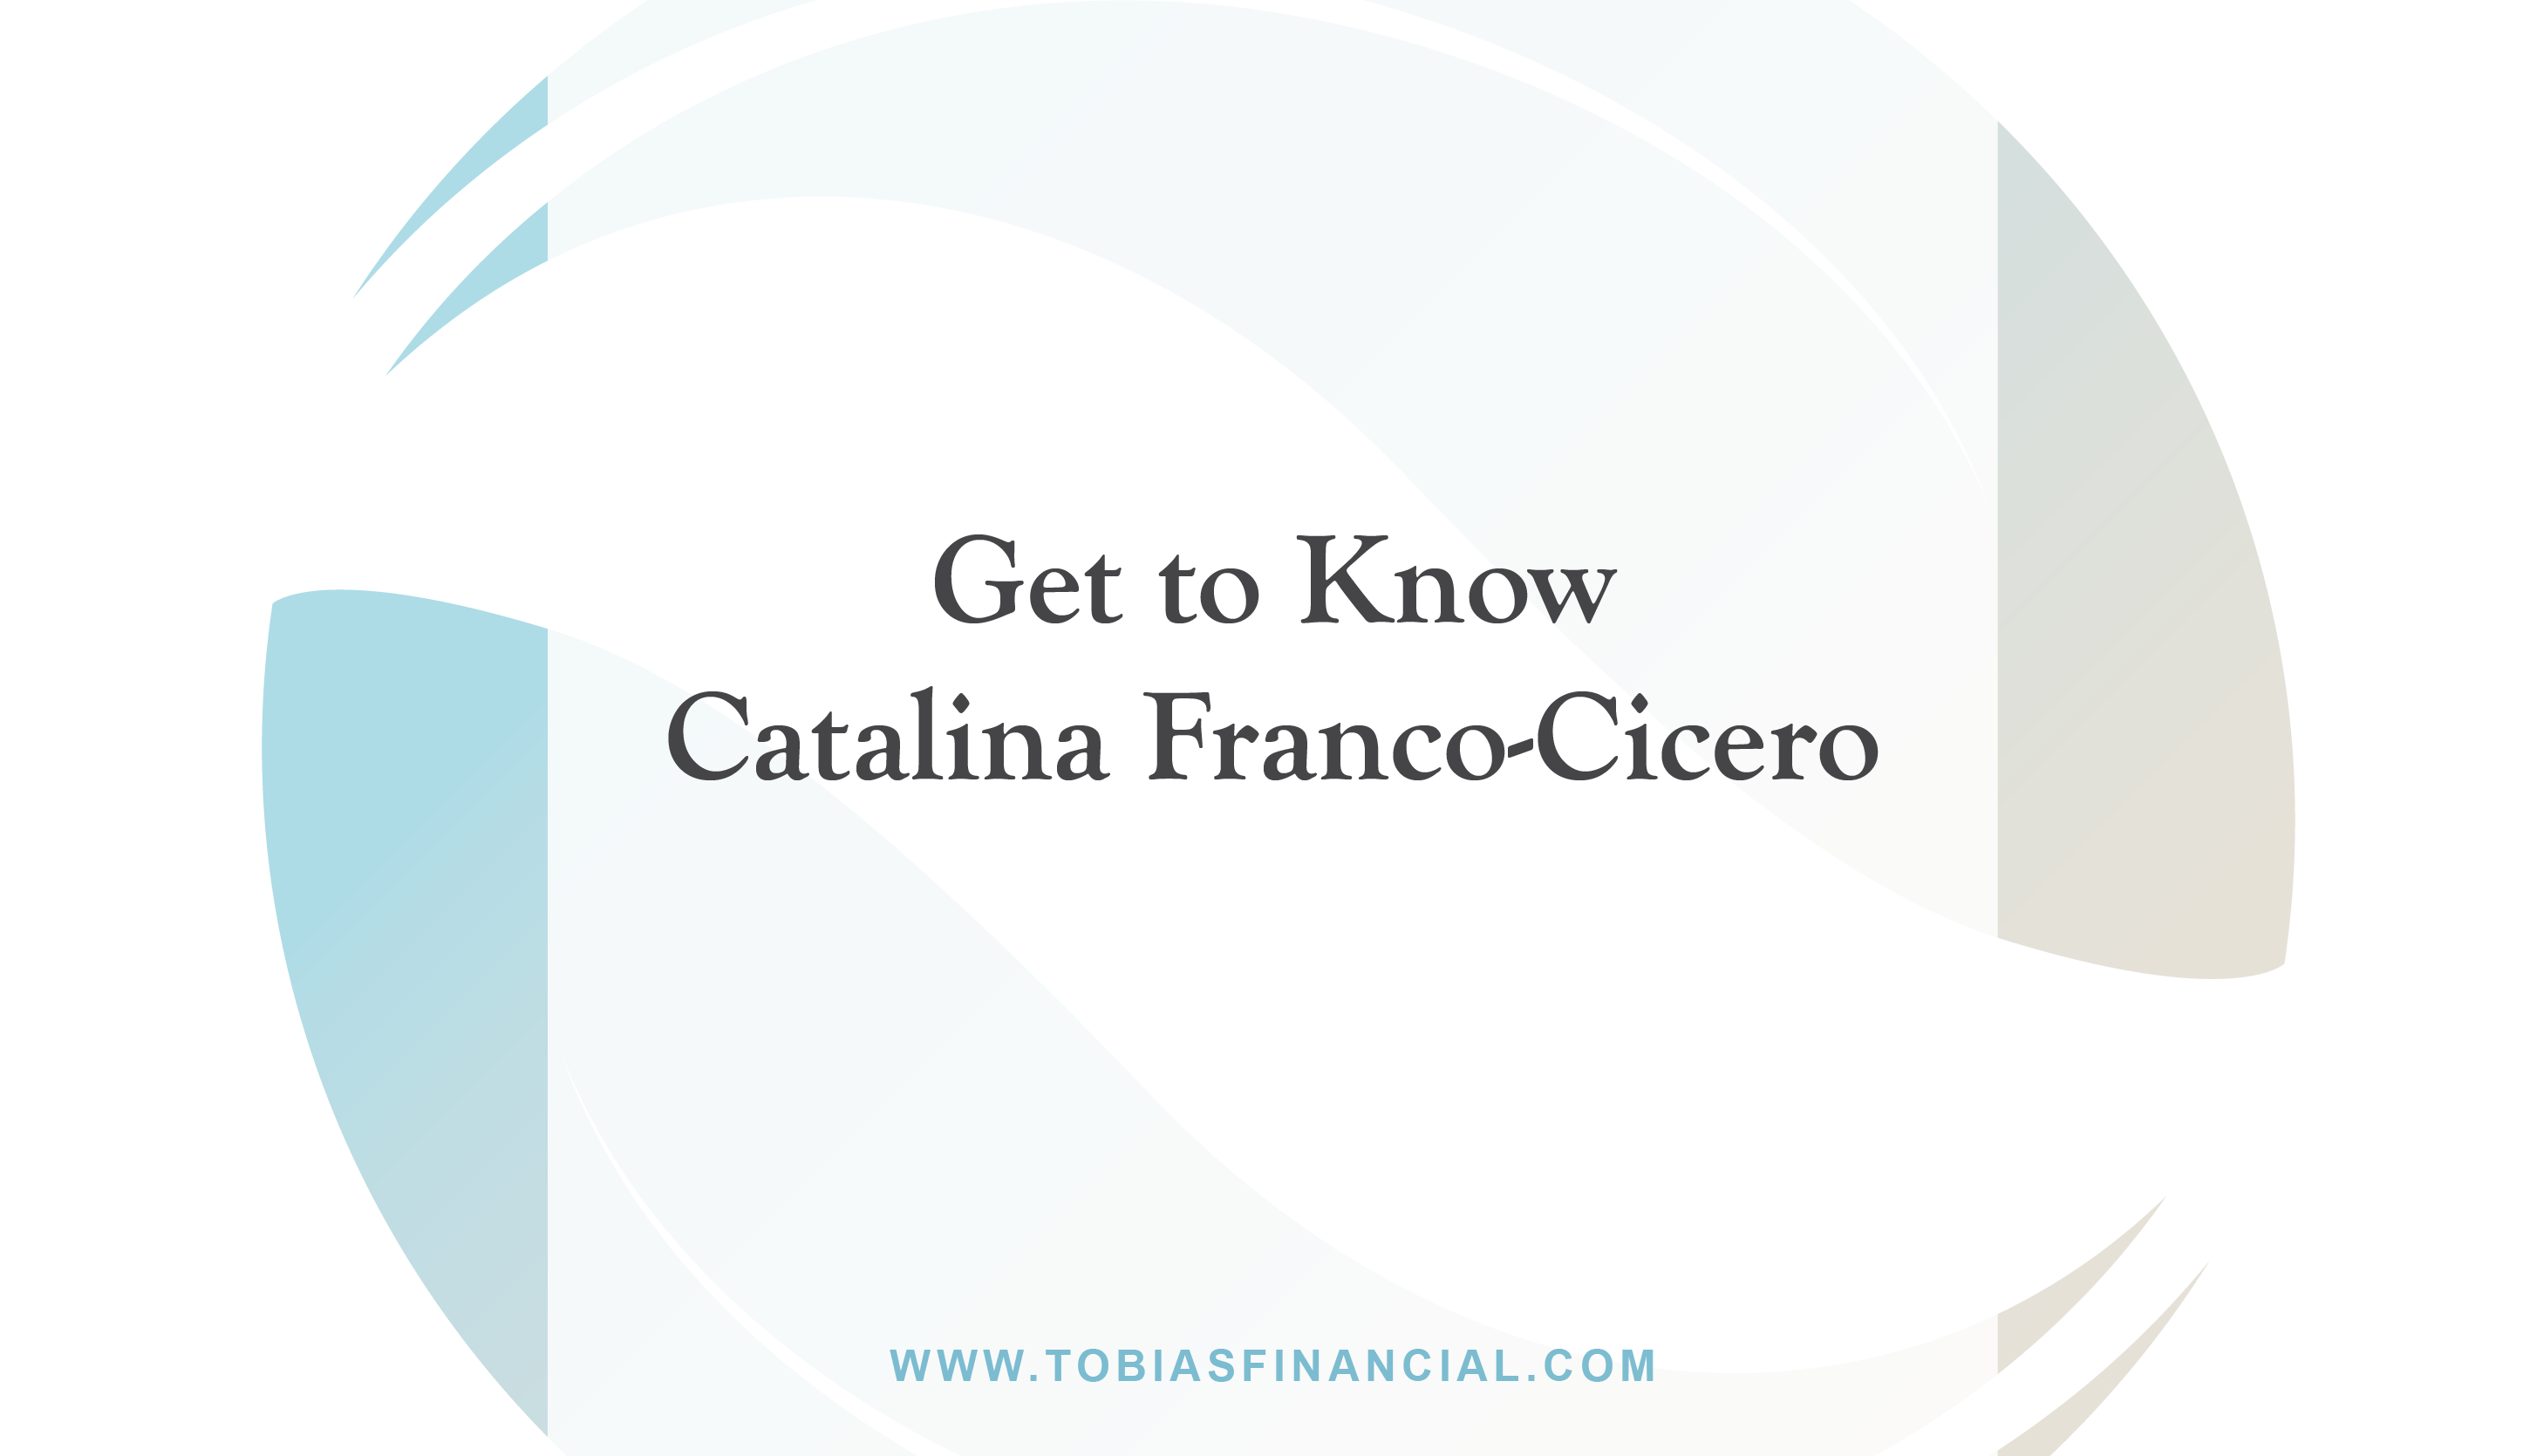 Get to Know Catalina Franco-Cicero